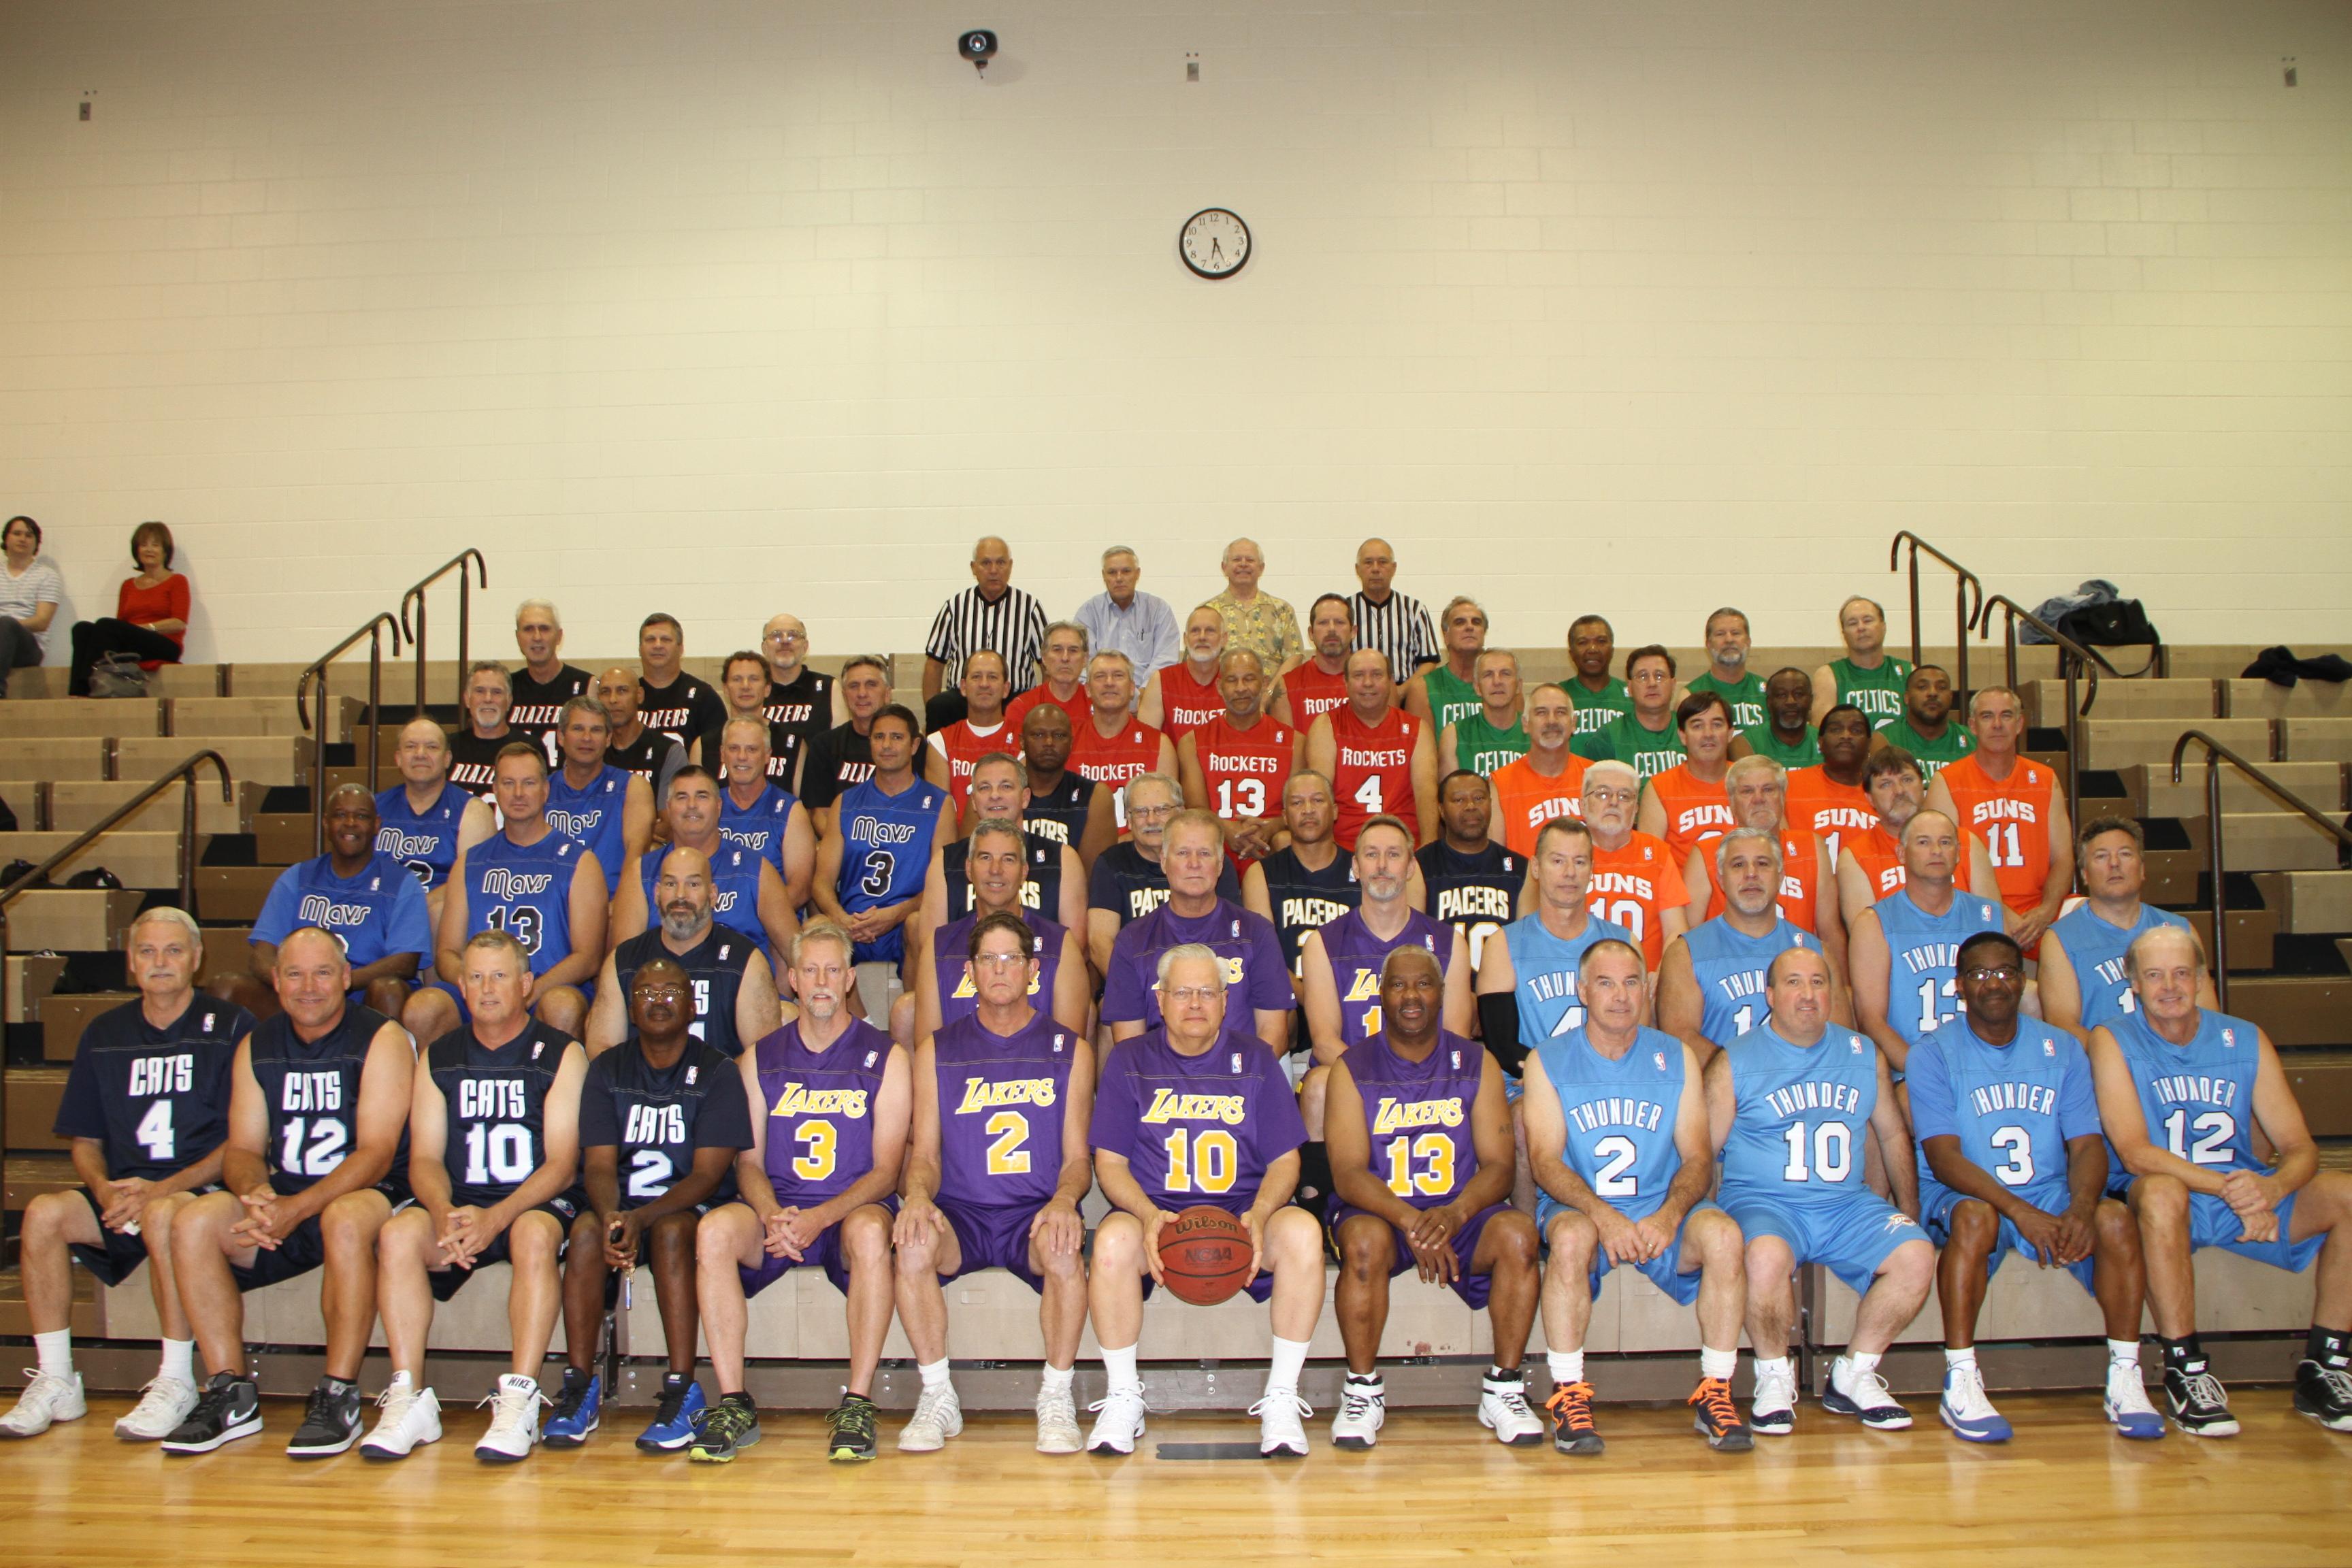 2014 league Photo